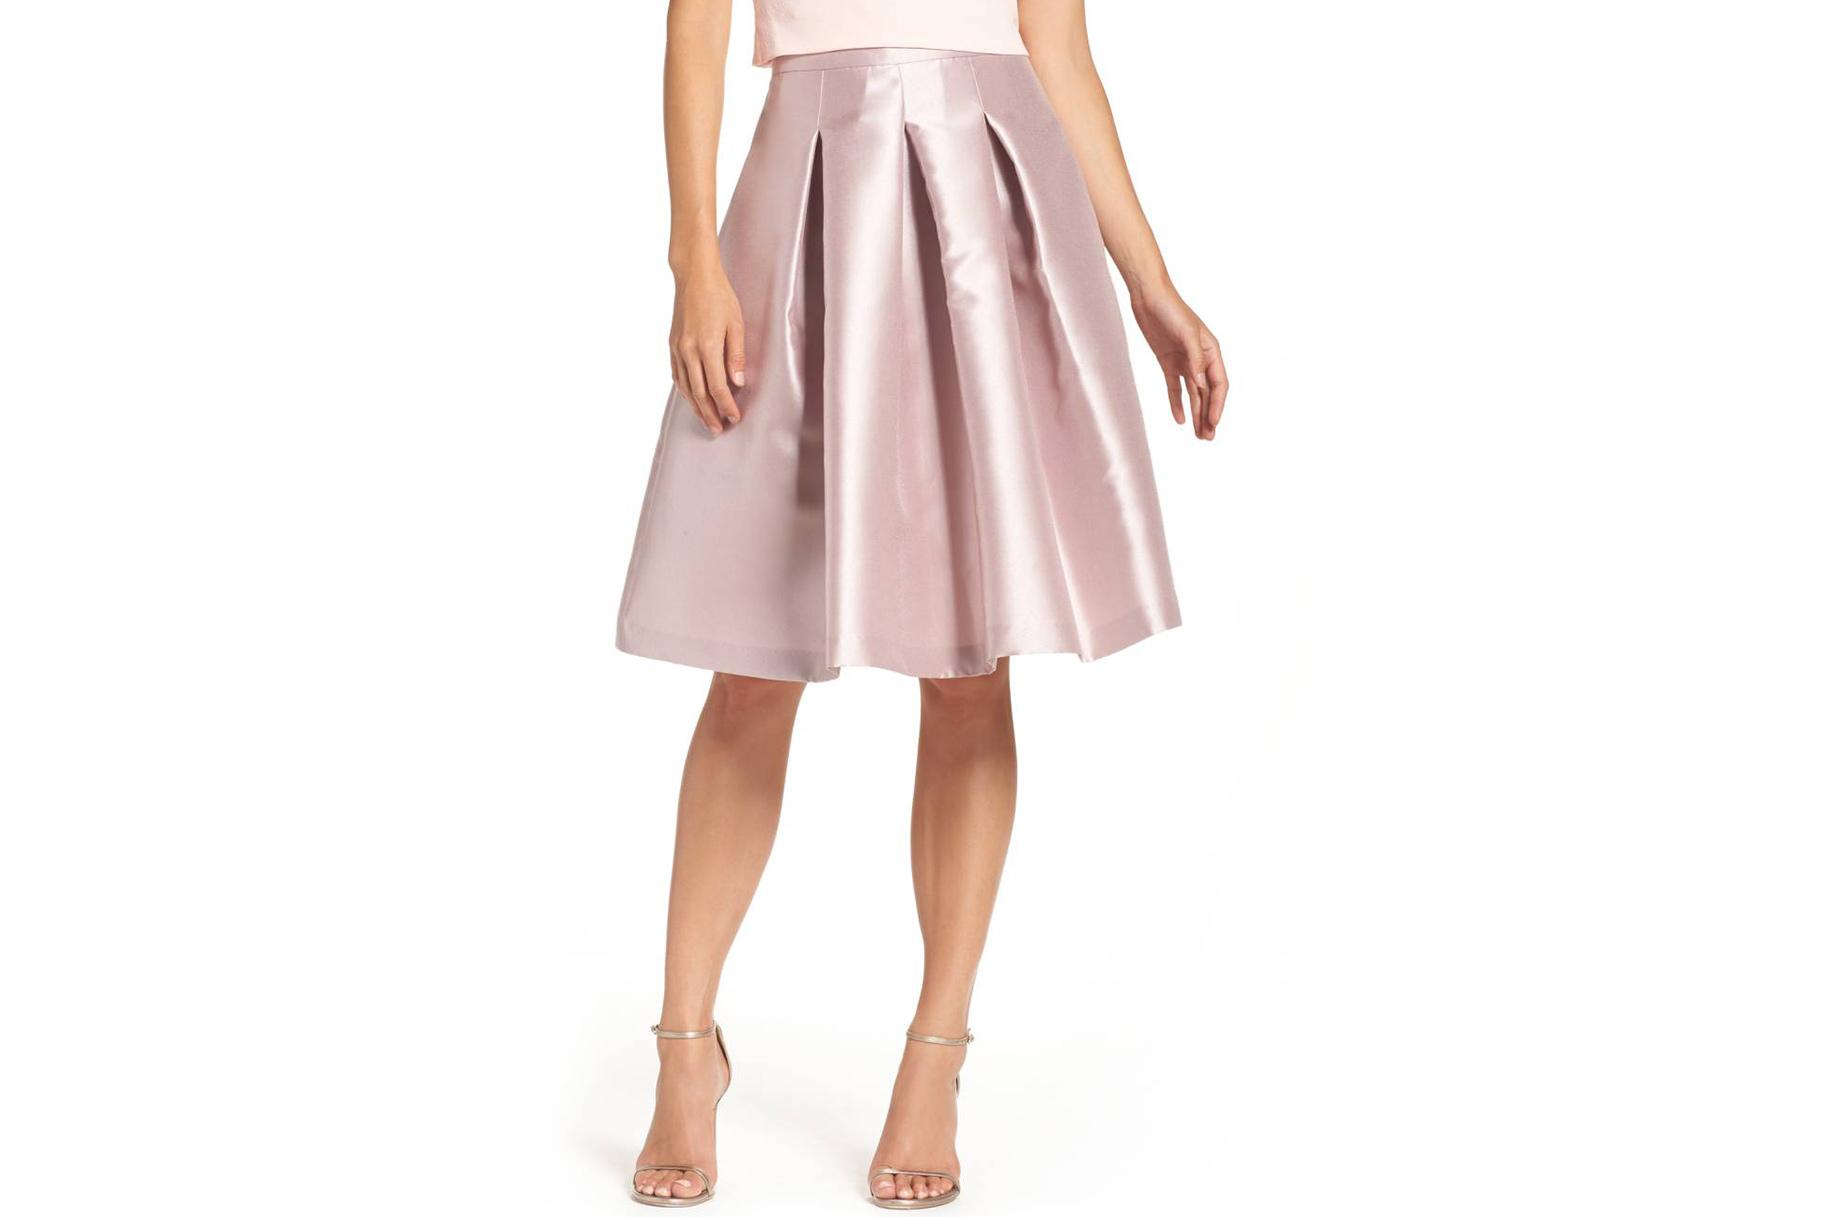 fef3e8937b Long Flowy Skirts Asos – DACC